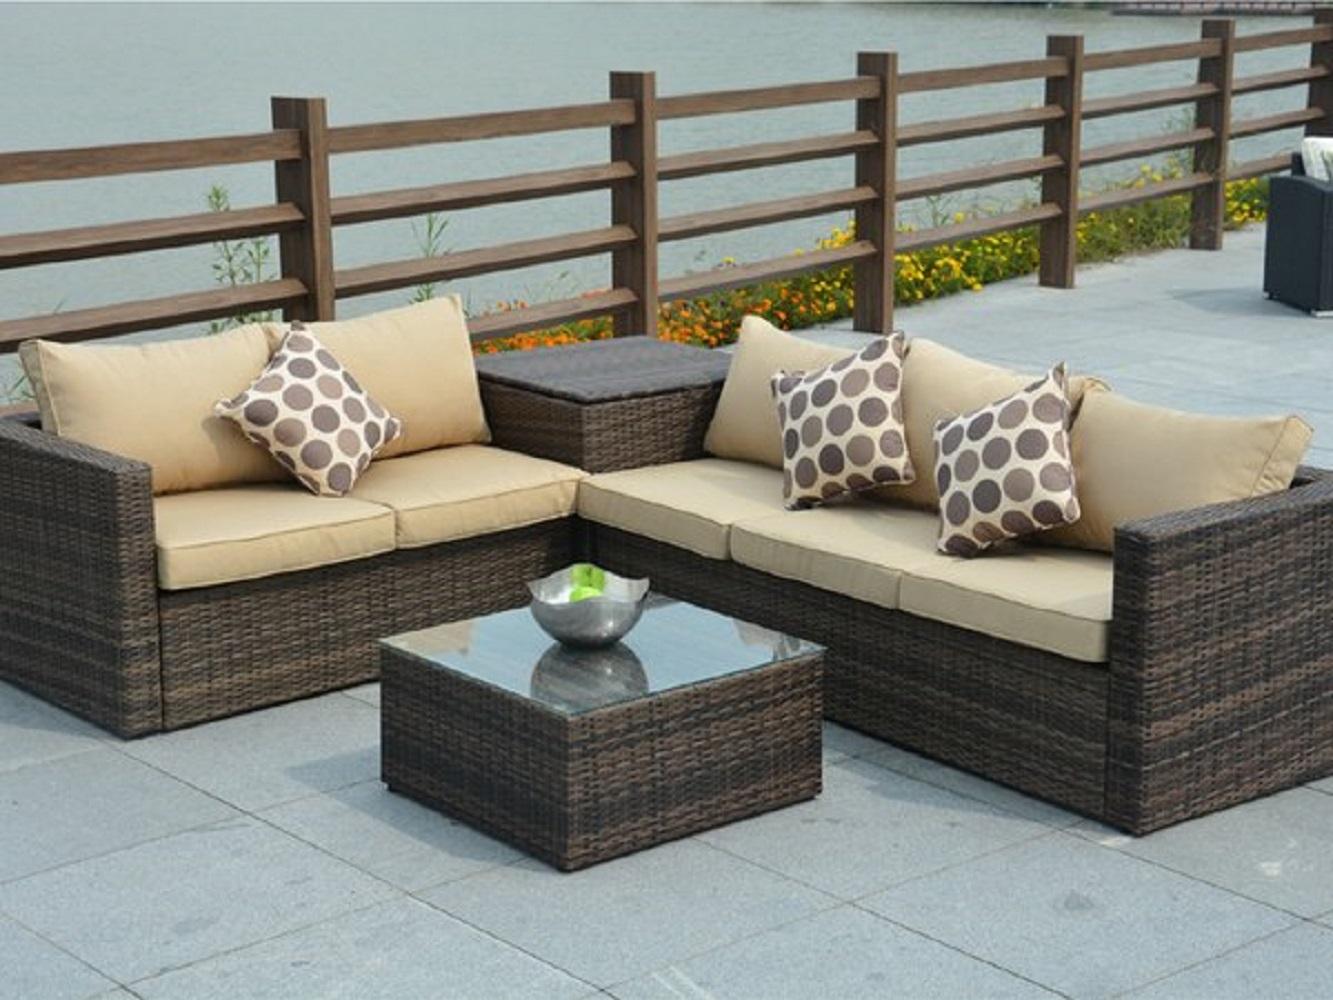 Jasmine Brown 4 Piece Outdoor Patio Furniture Conversation Set ...